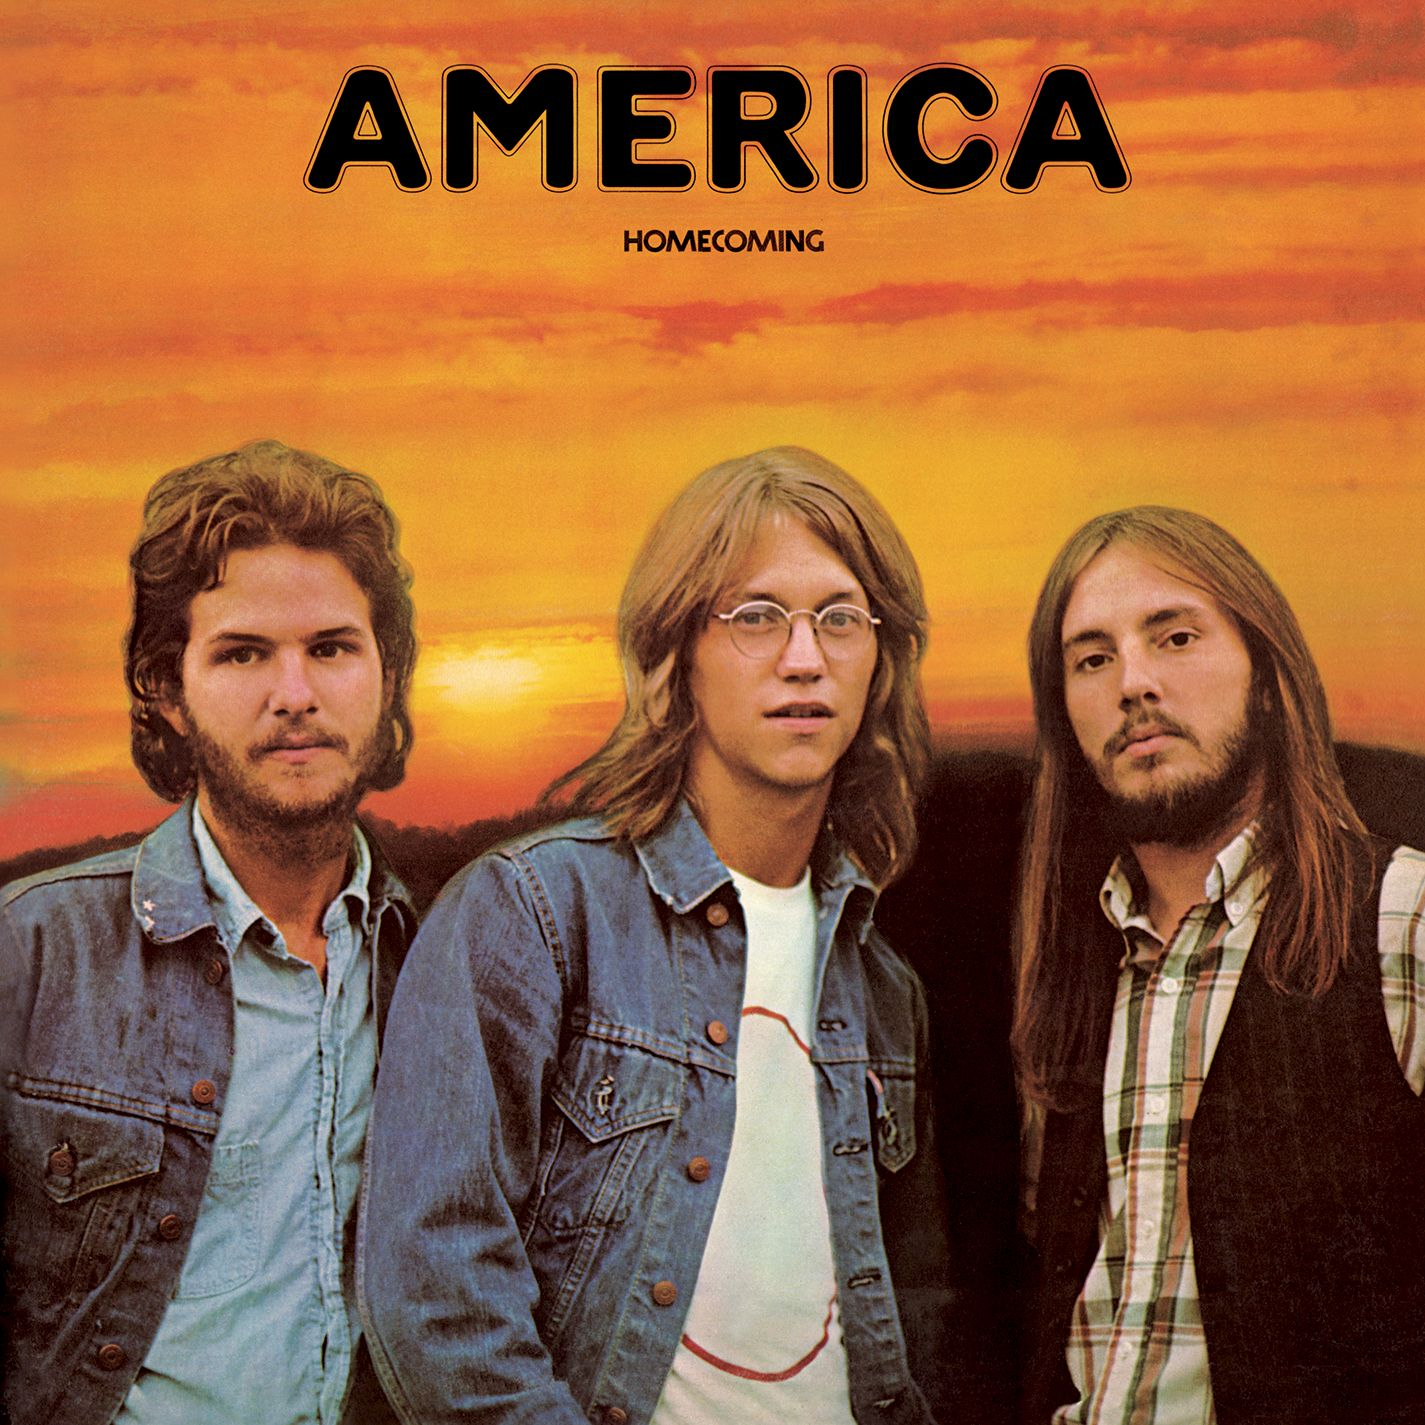 America - Homecoming (180 Gram Audiophile Vinyl)